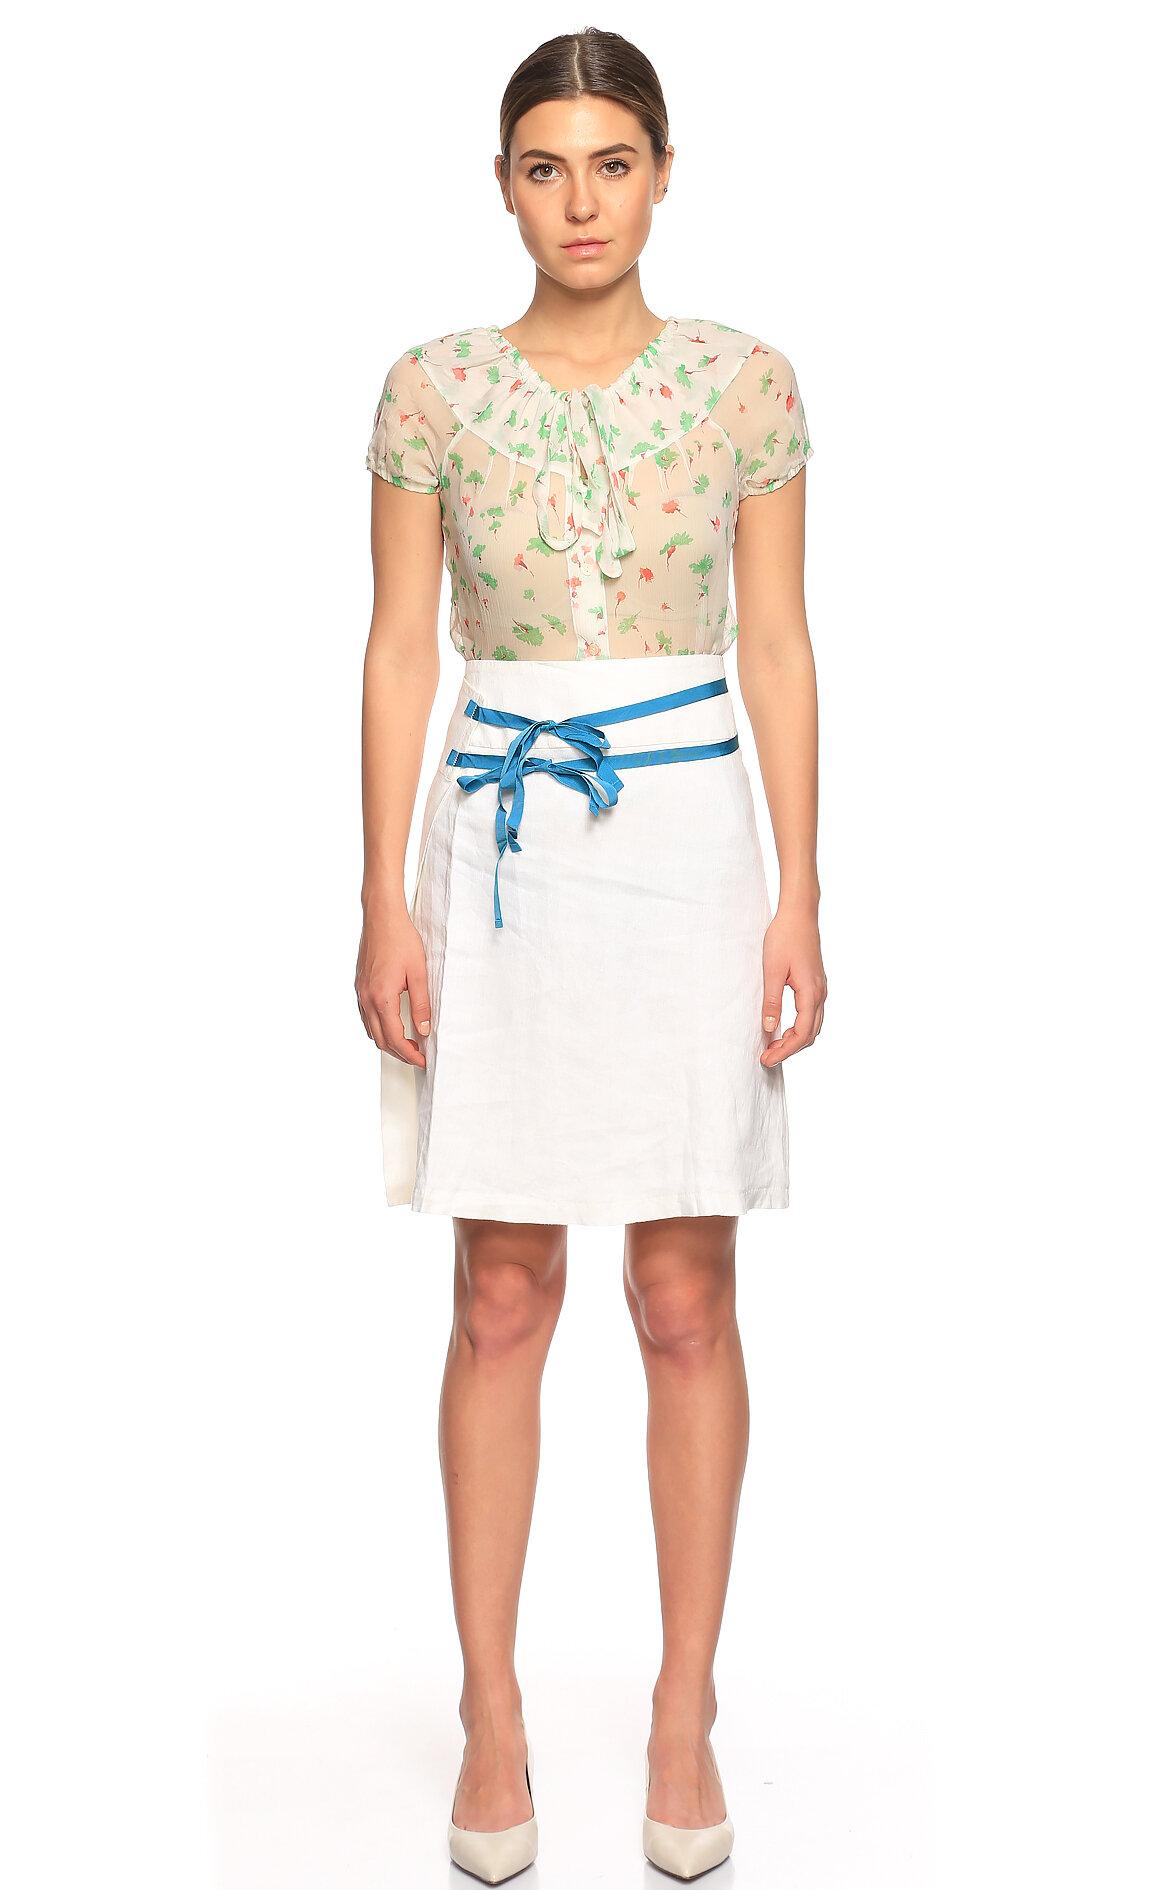 Fornarina Jeans-Fornarina Jeans Keten Beyaz Etek